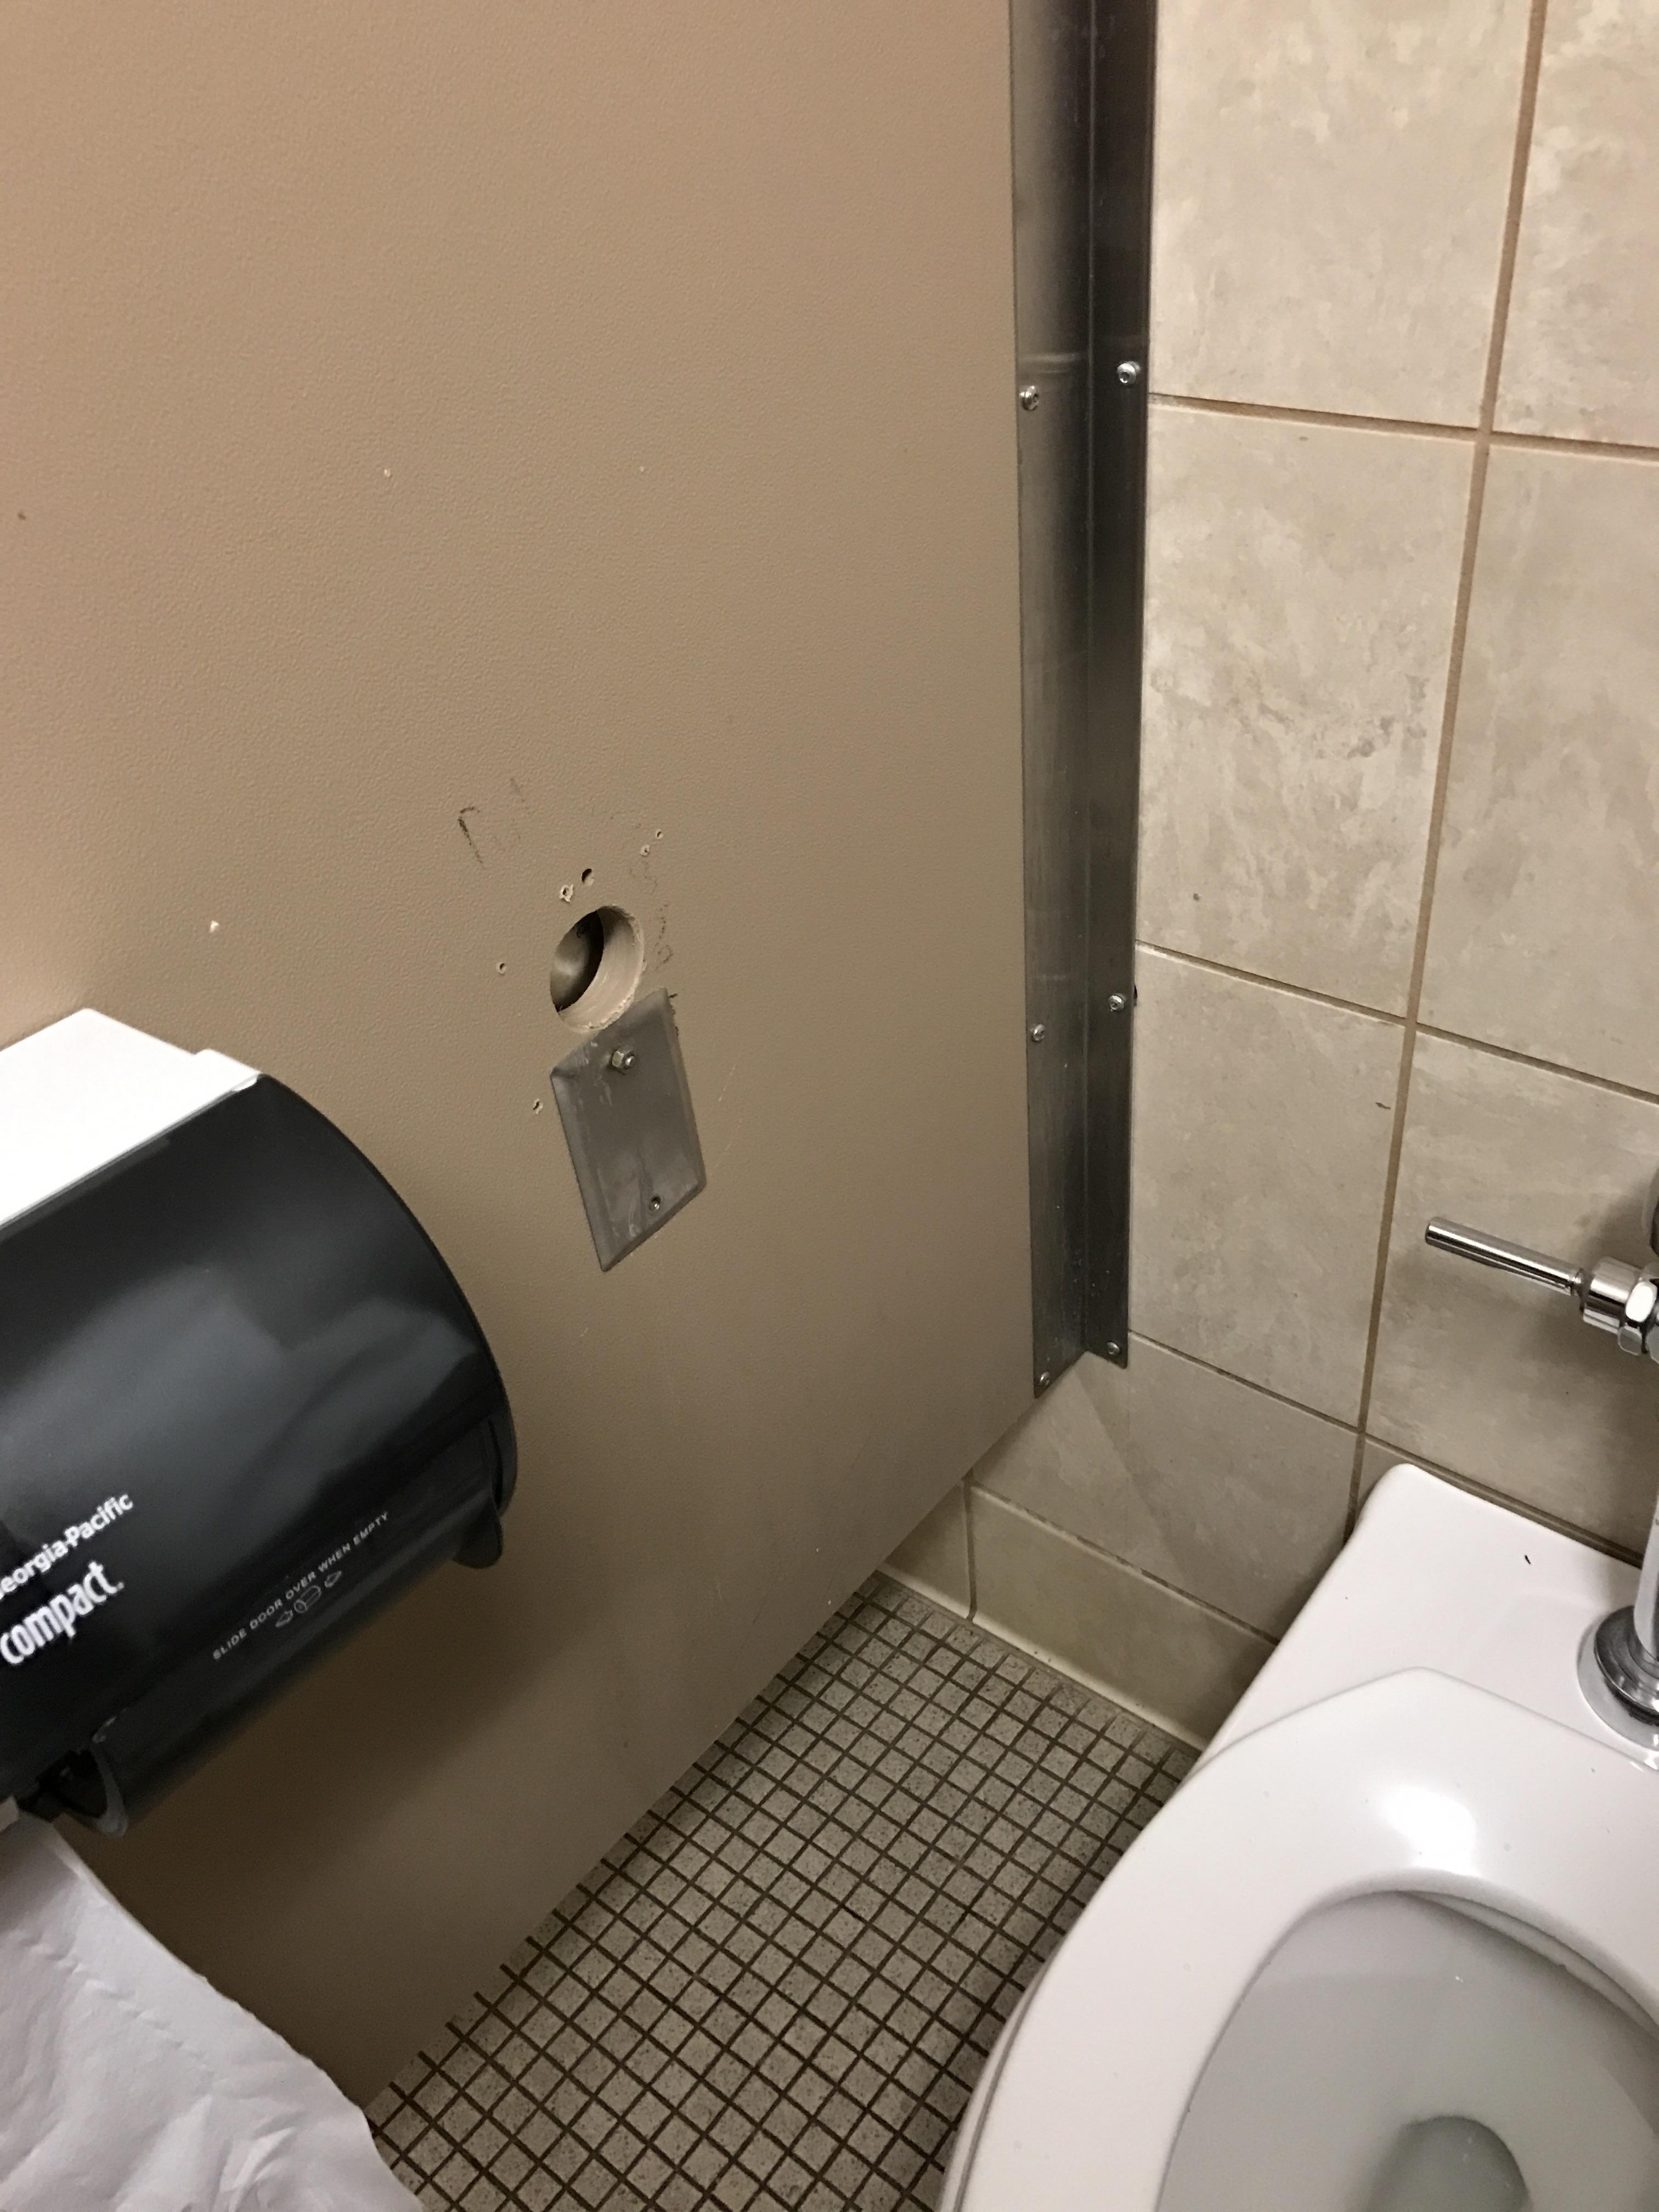 Sucked clit where is a gloryhole